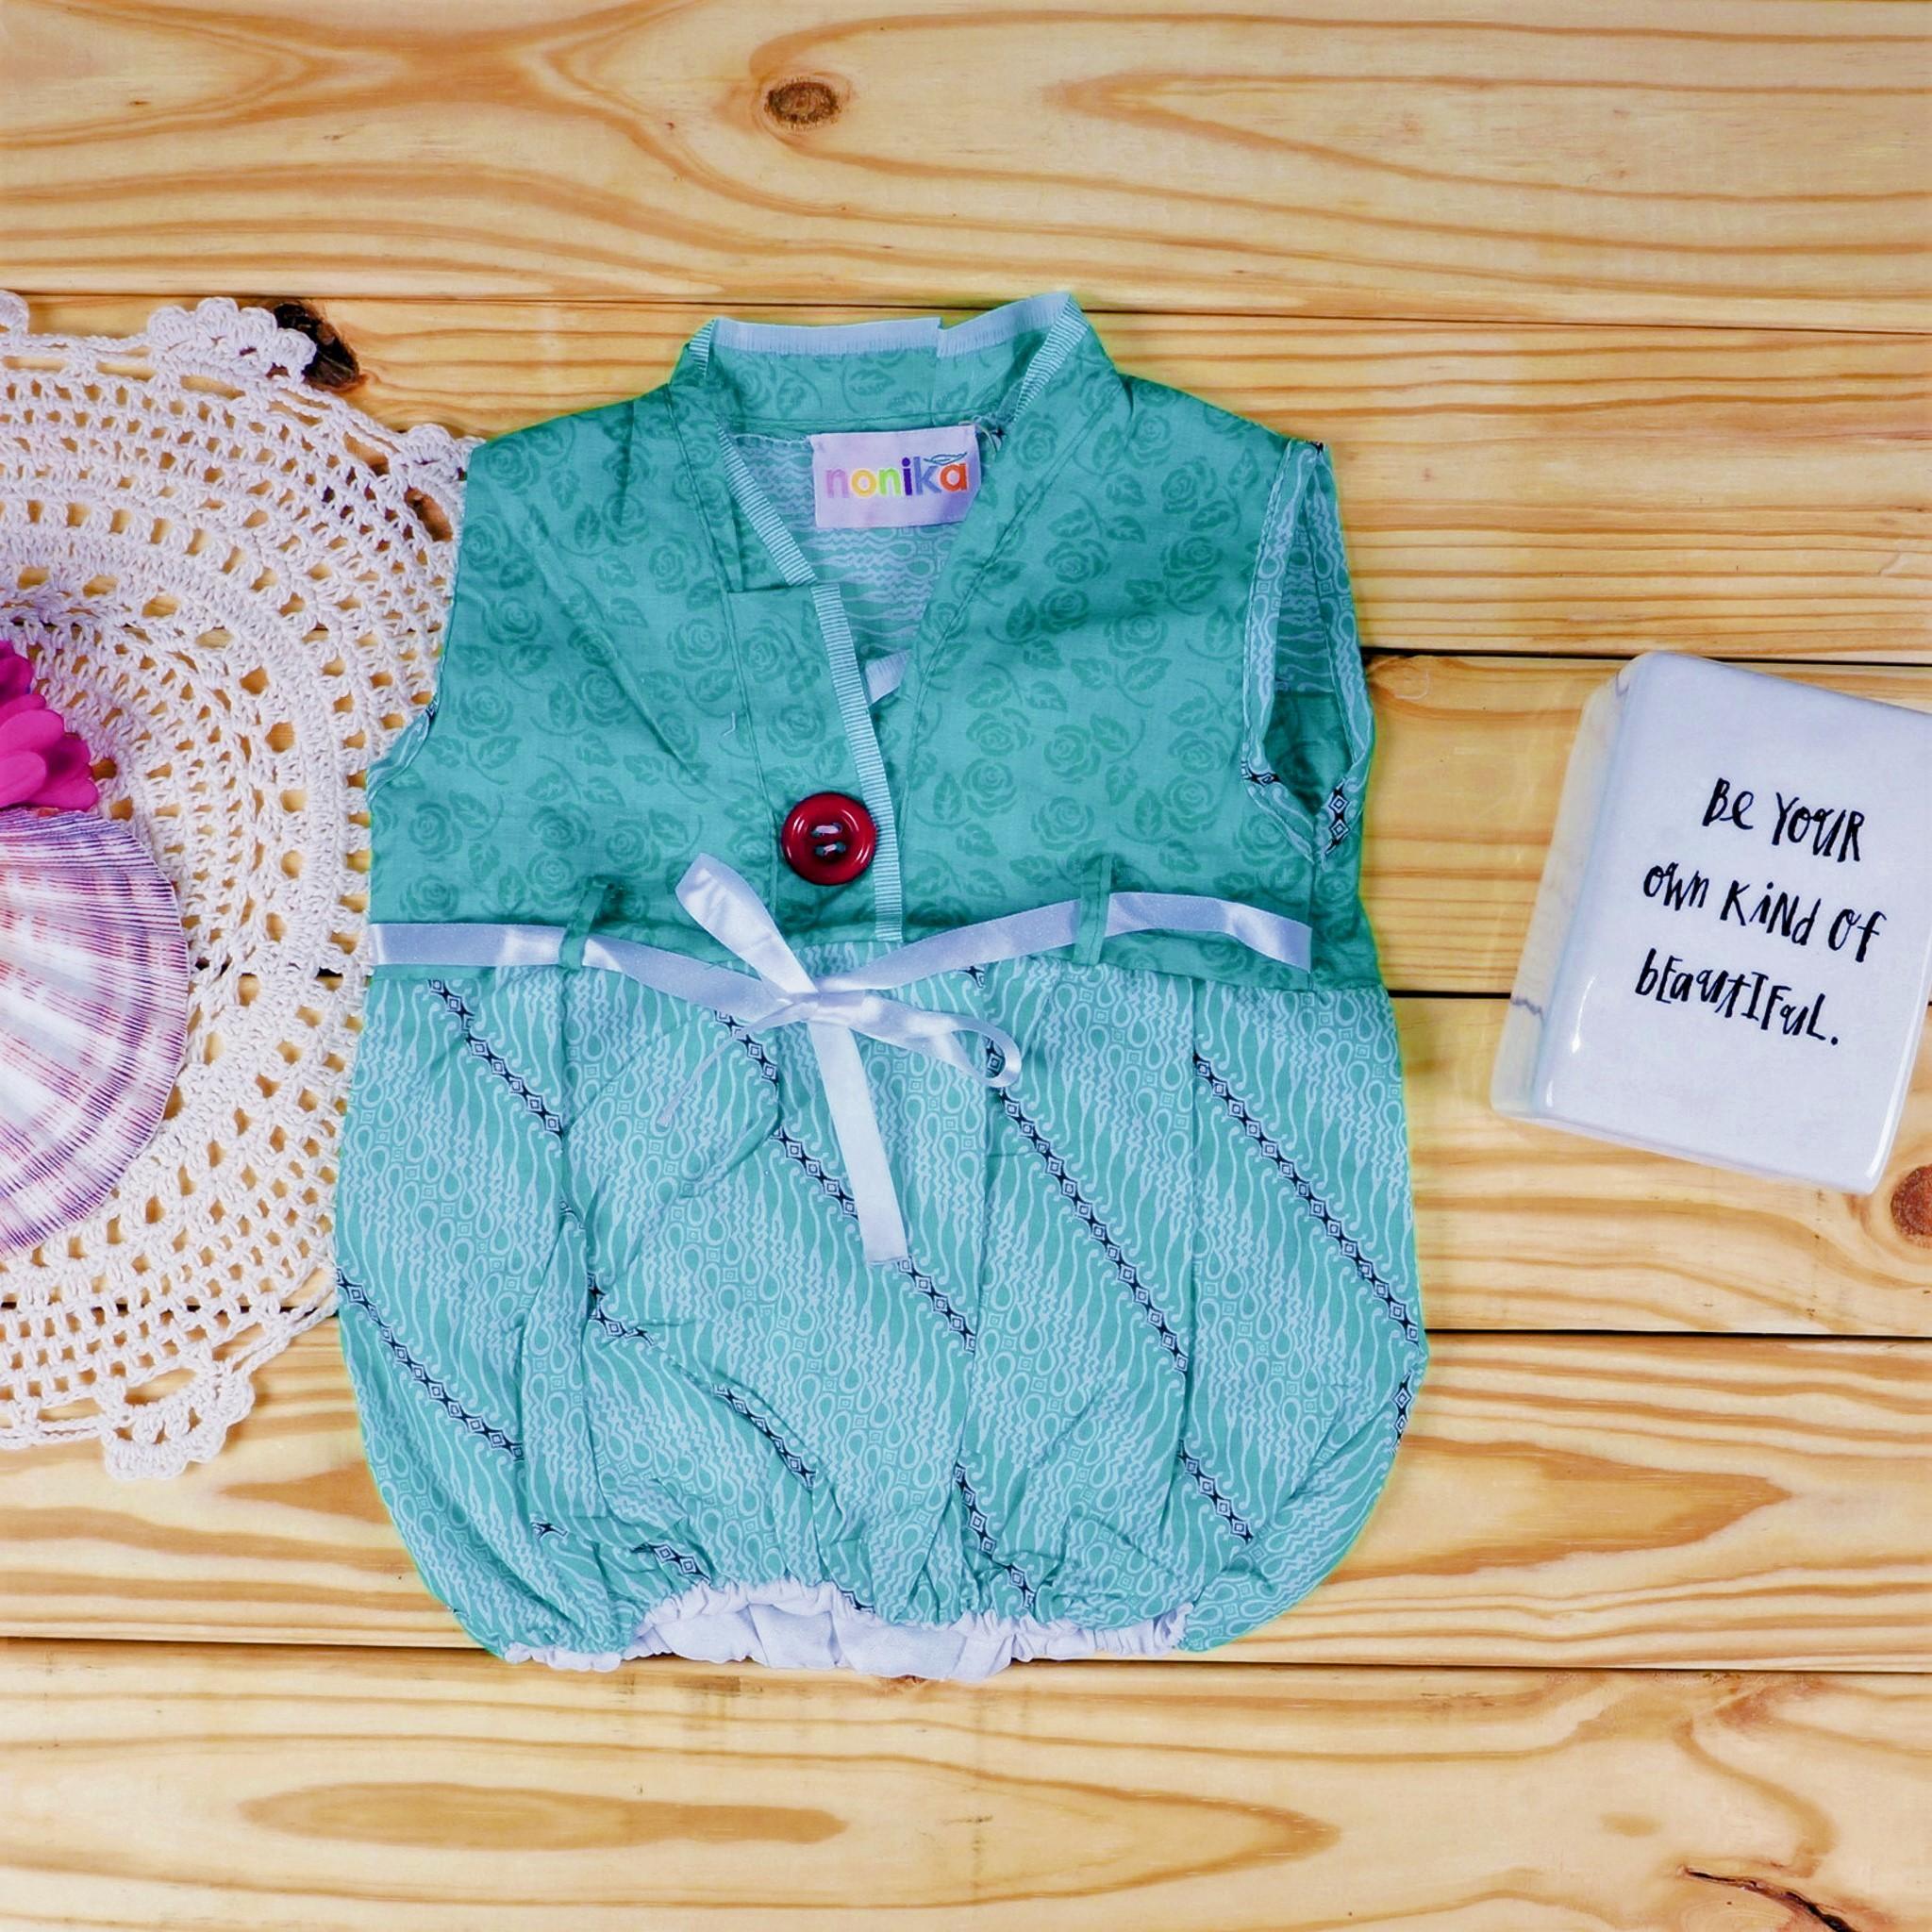 1f2d07690a25 Baby Batik Parang Turquoise Floral Balloon Dress - Size 3-6 Month ...